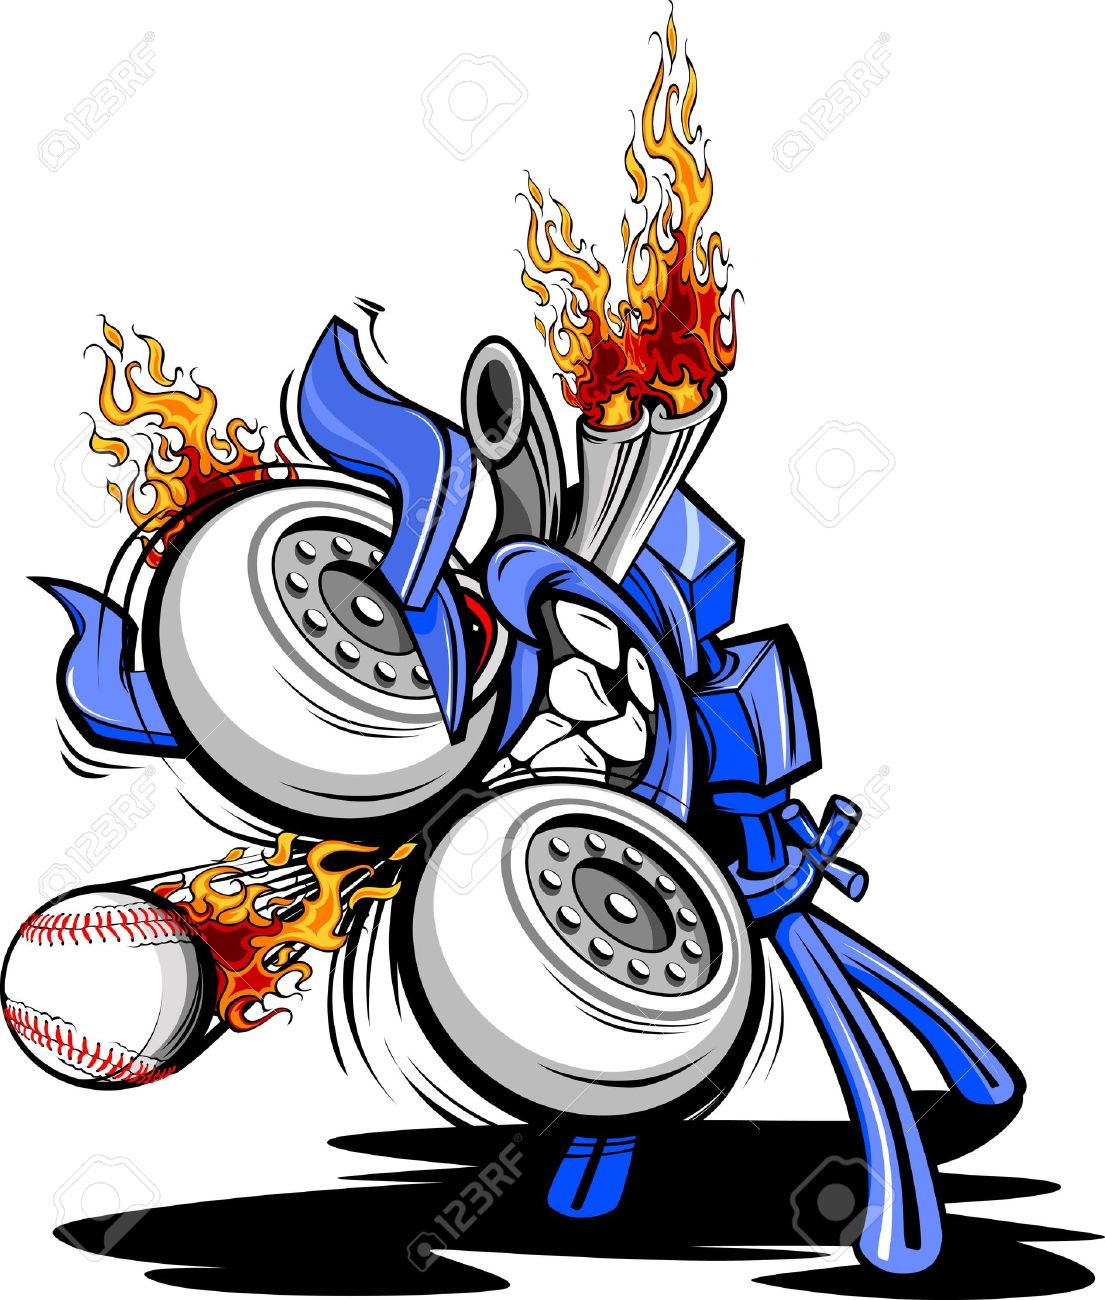 1105x1300 Cartoon Vector Illustration Of A Monster Baseball Pitching Machine